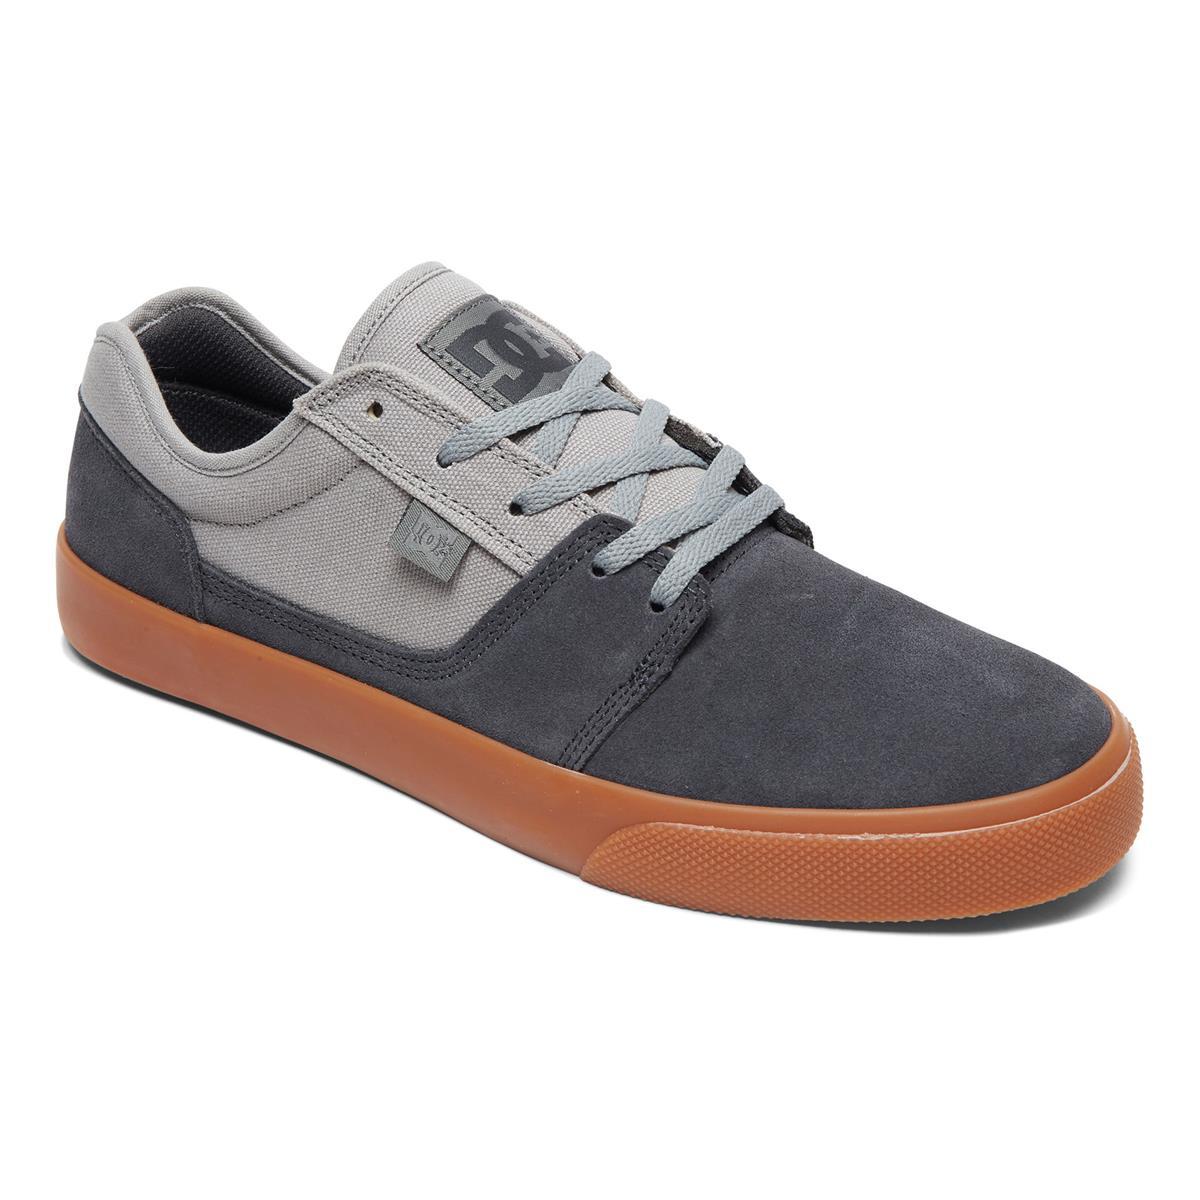 DC Schuhe Tonik Grau/Hellgrau